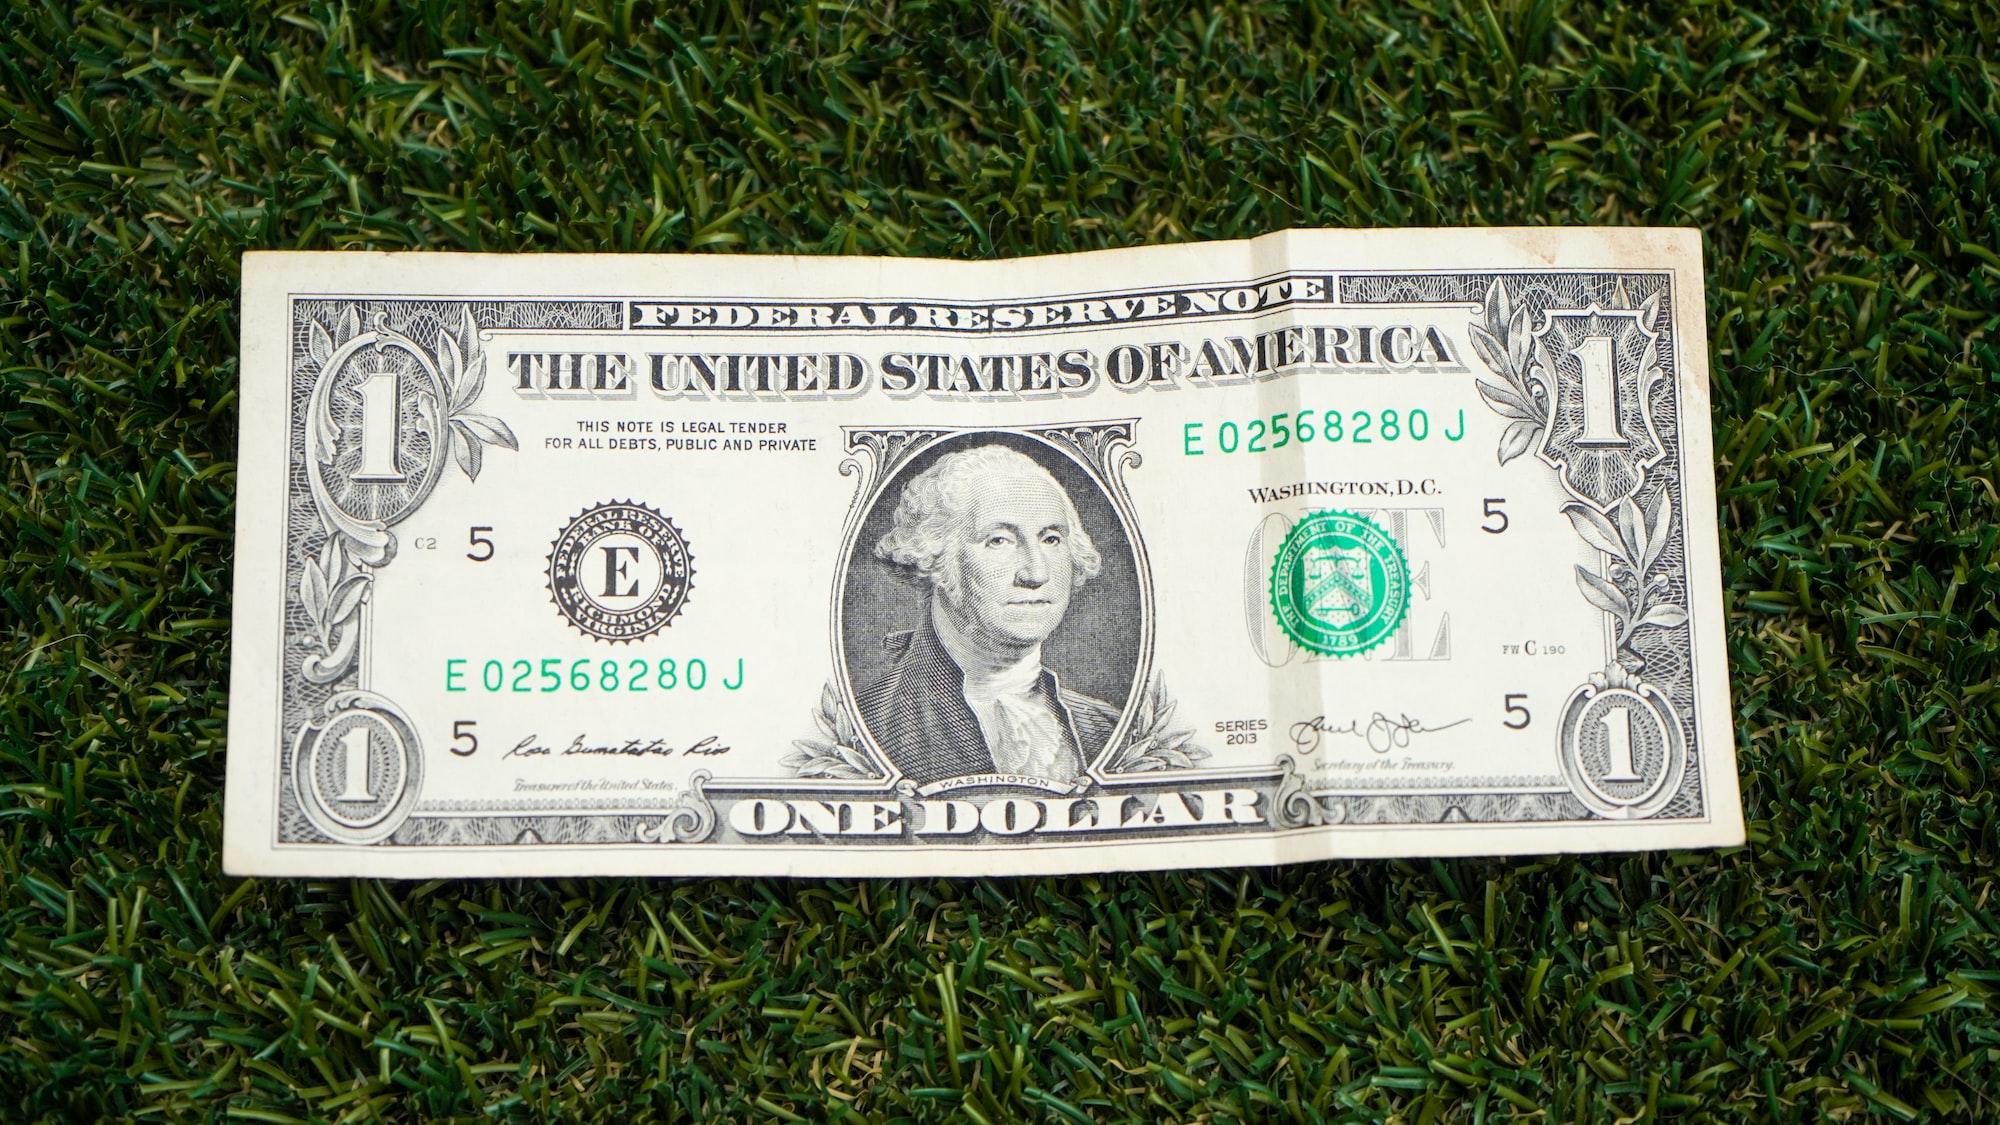 One American dollar bill on the fake grass field.